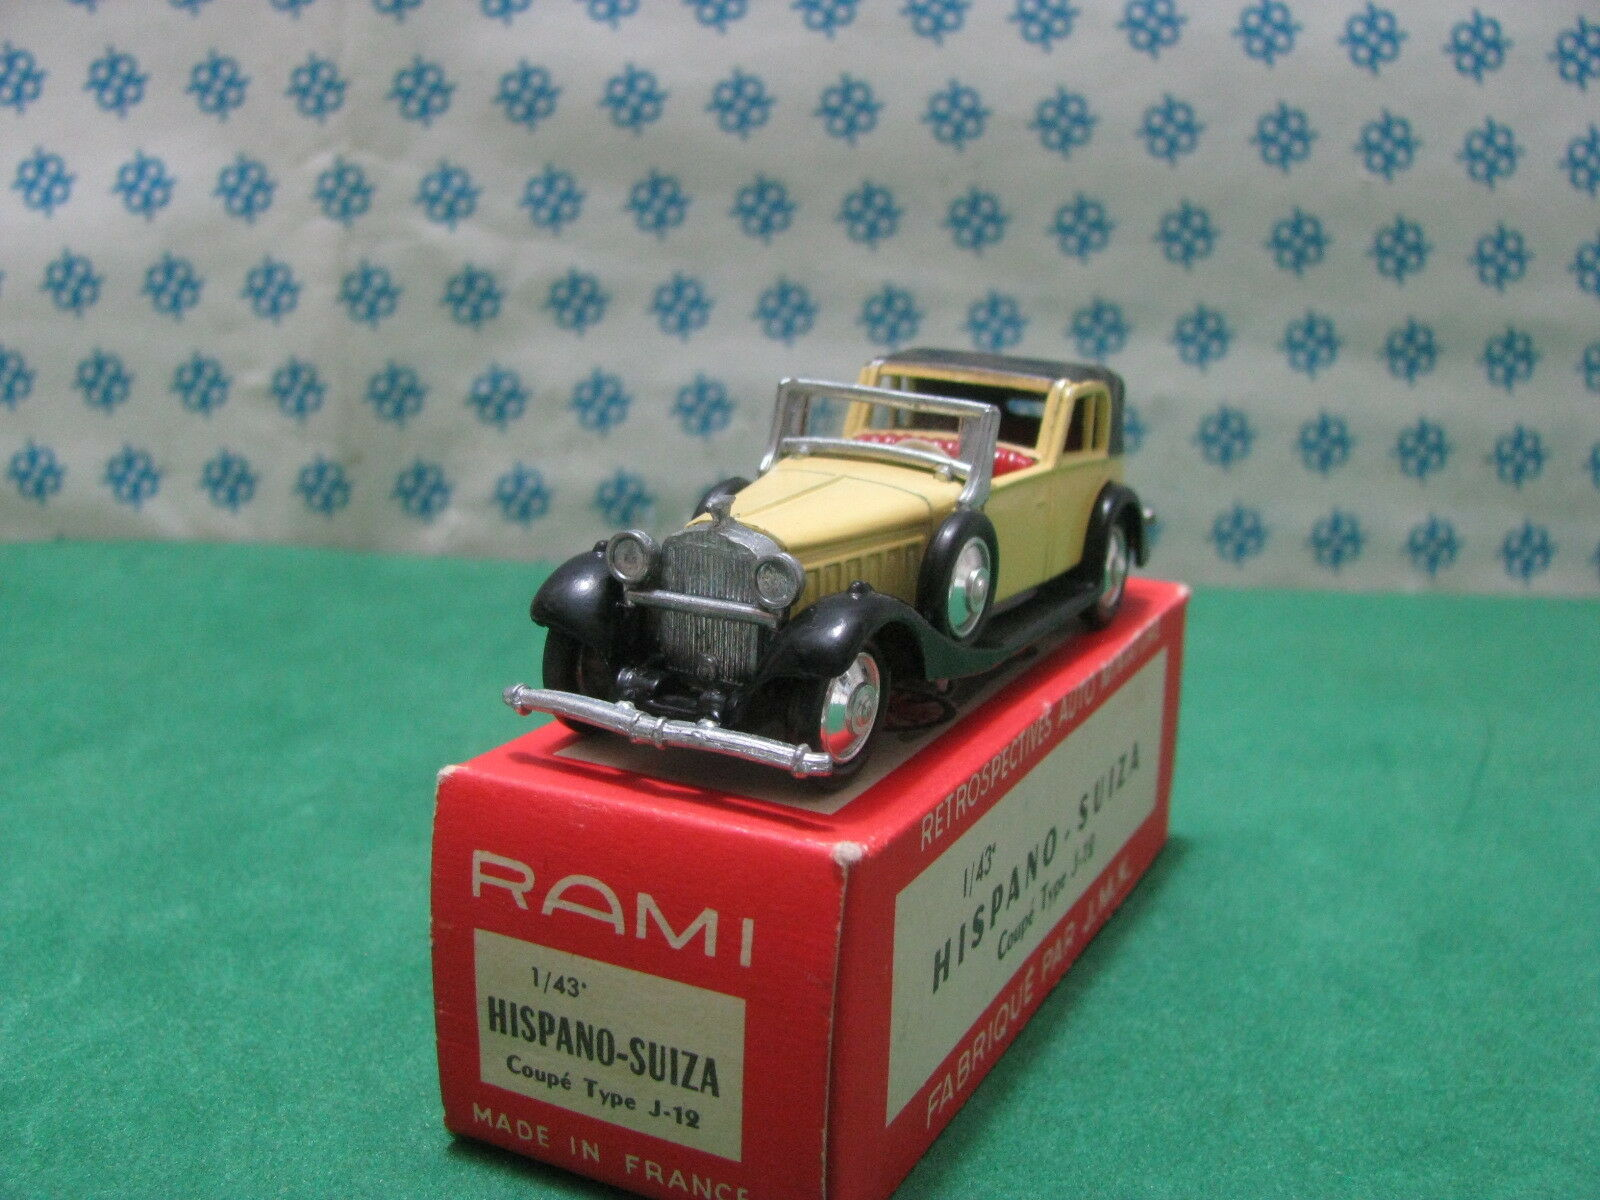 Vintage Rami - HISPANO SUIZA coupé modèl J-12 J-12 J-12 - 1 43 France 14c7df